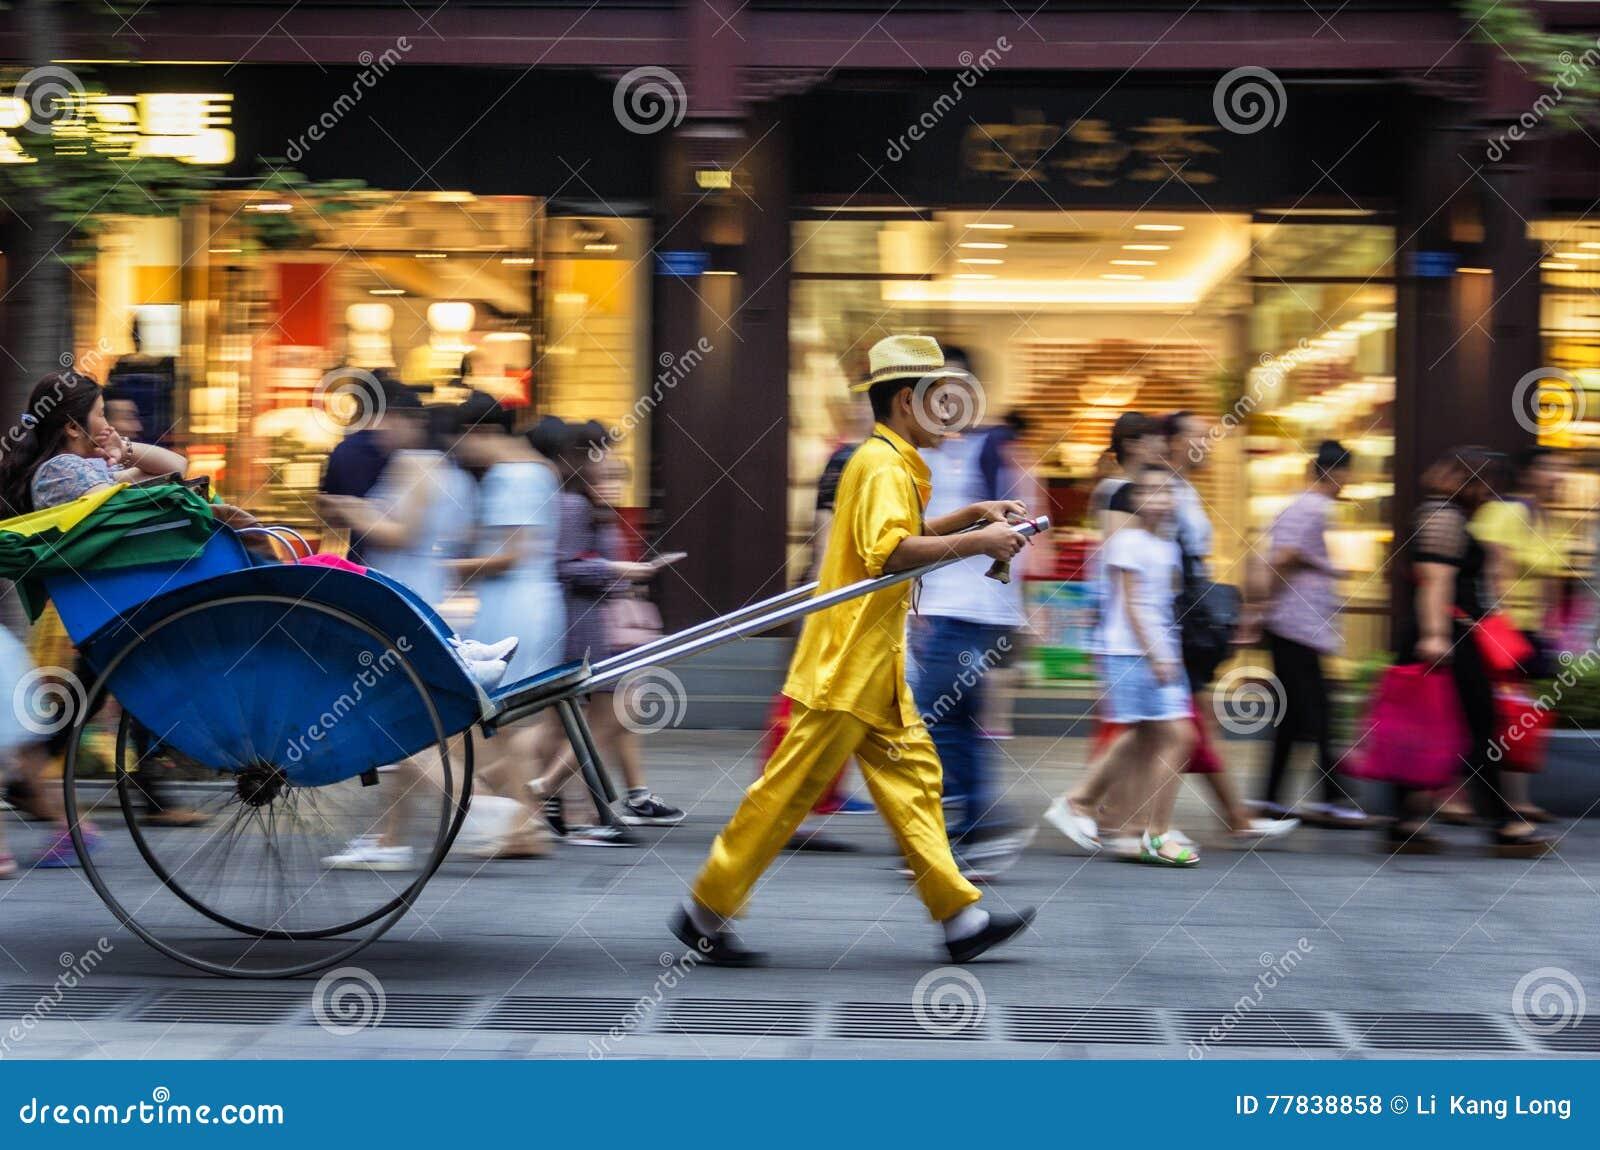 Rickshawpullers